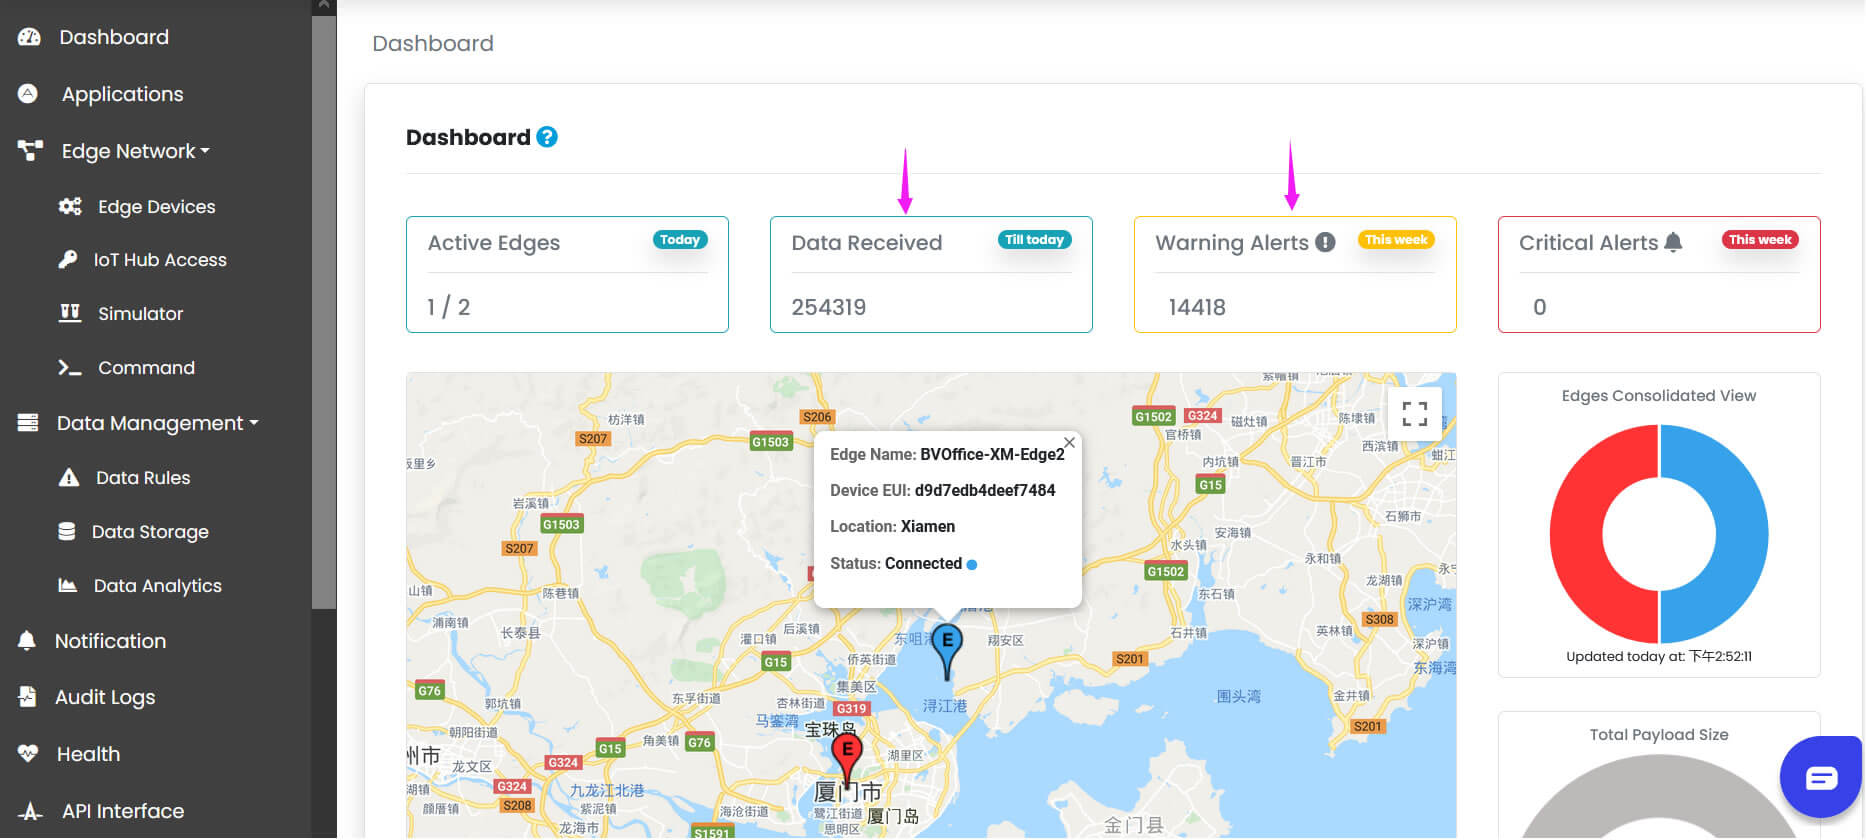 Find a SaaS IoT platform